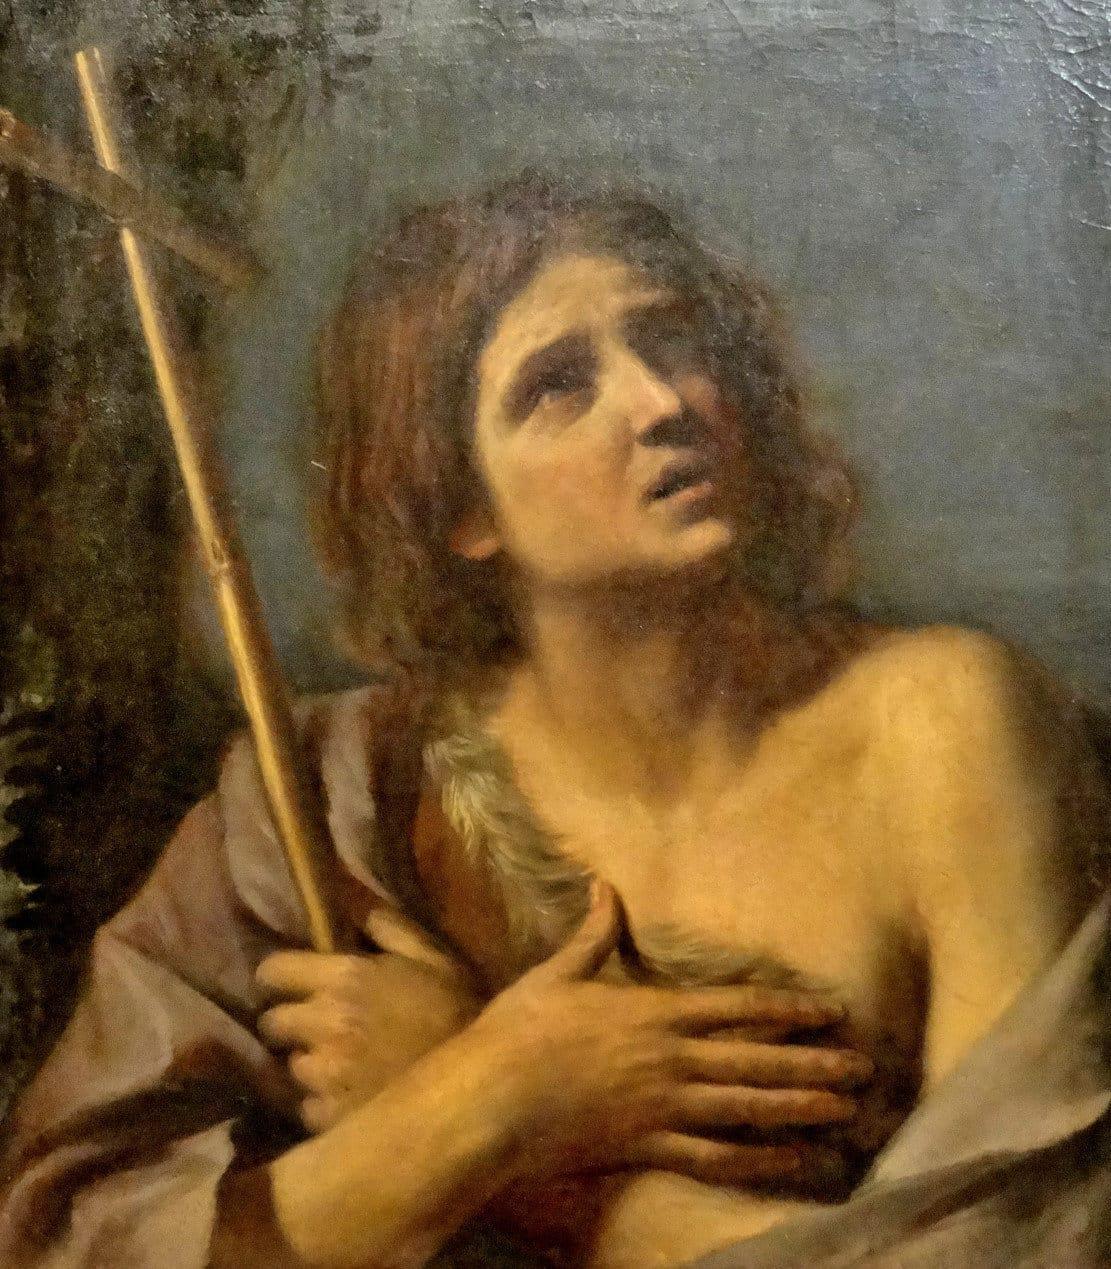 Giovan Francesco Barbier (1591-1666) - St. John the Baptist - Vatican Art Gallery